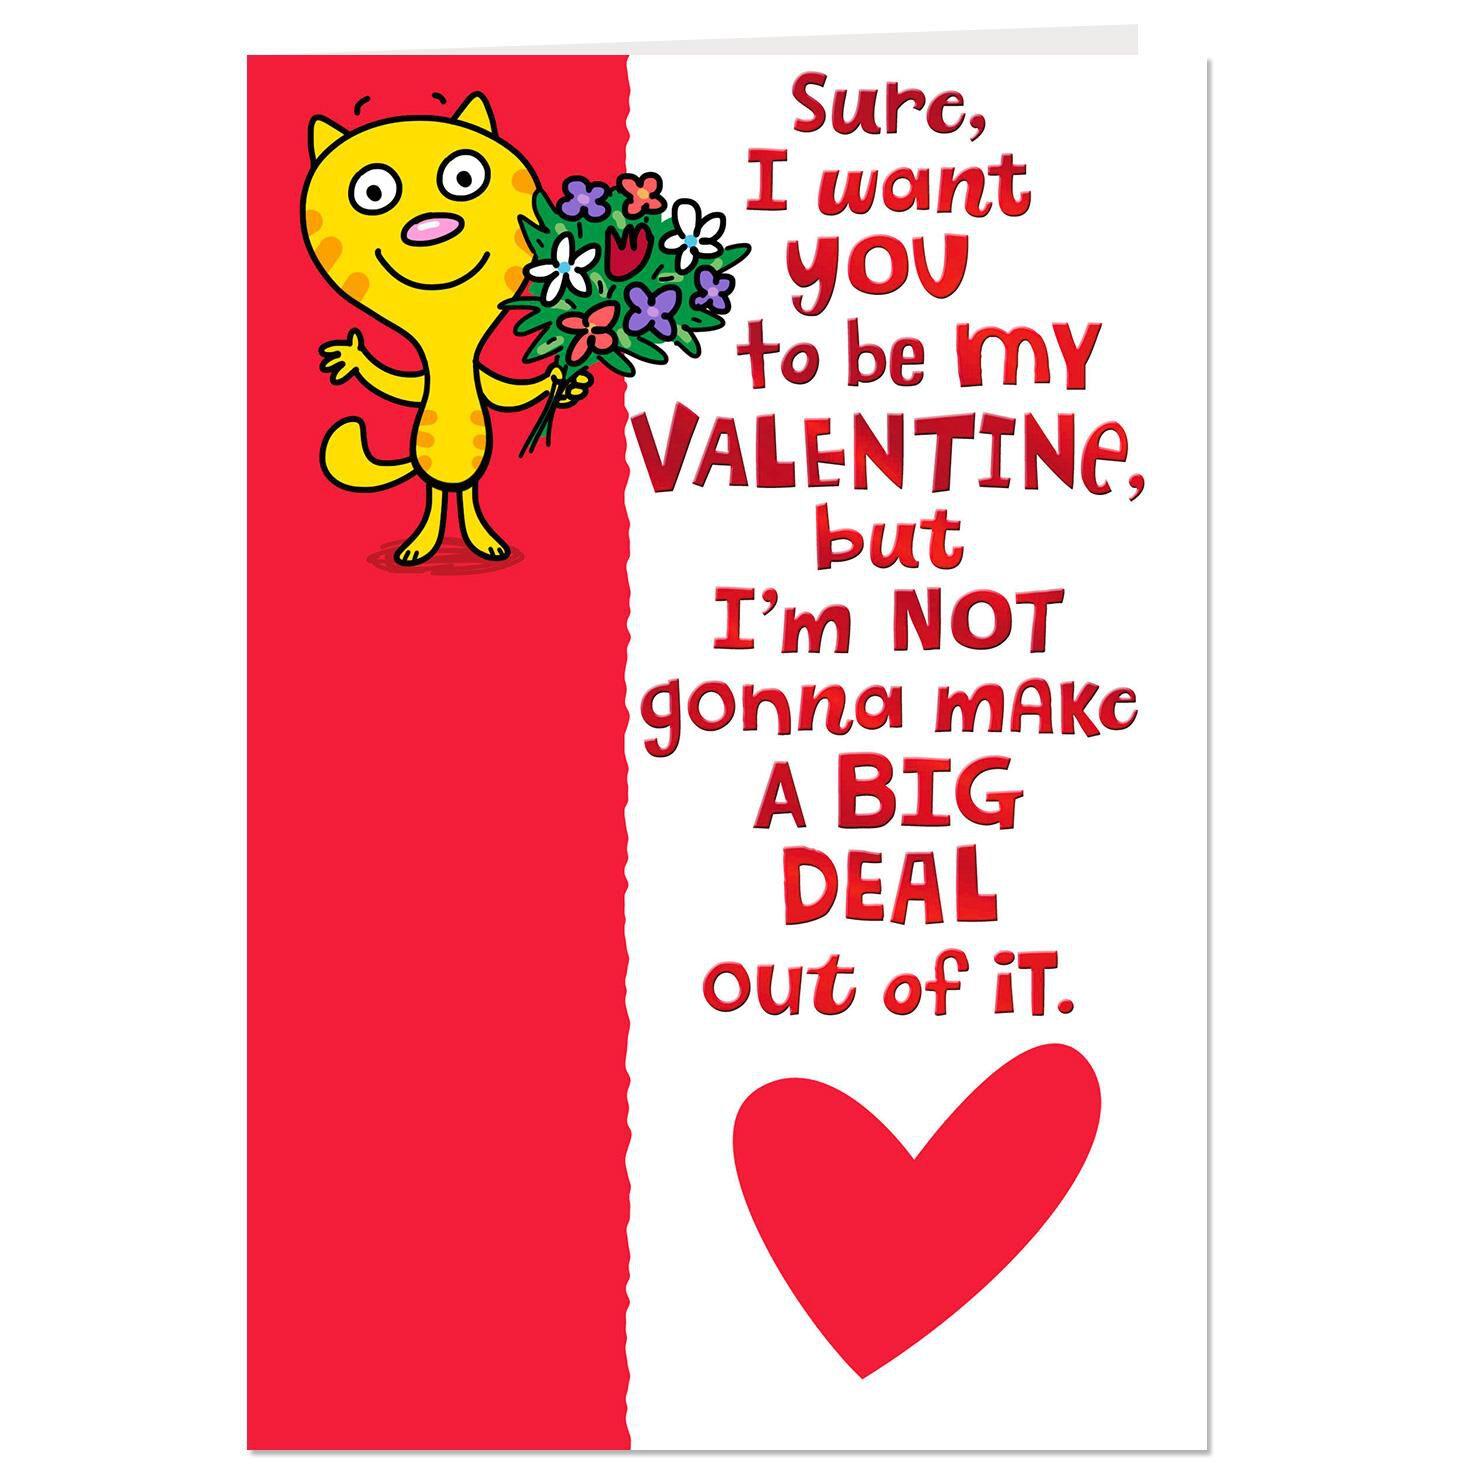 Be My Valentine Funny Valentineu0027s Day Card   Greeting Cards   Hallmark    Hallmark Valentineu0027s Day